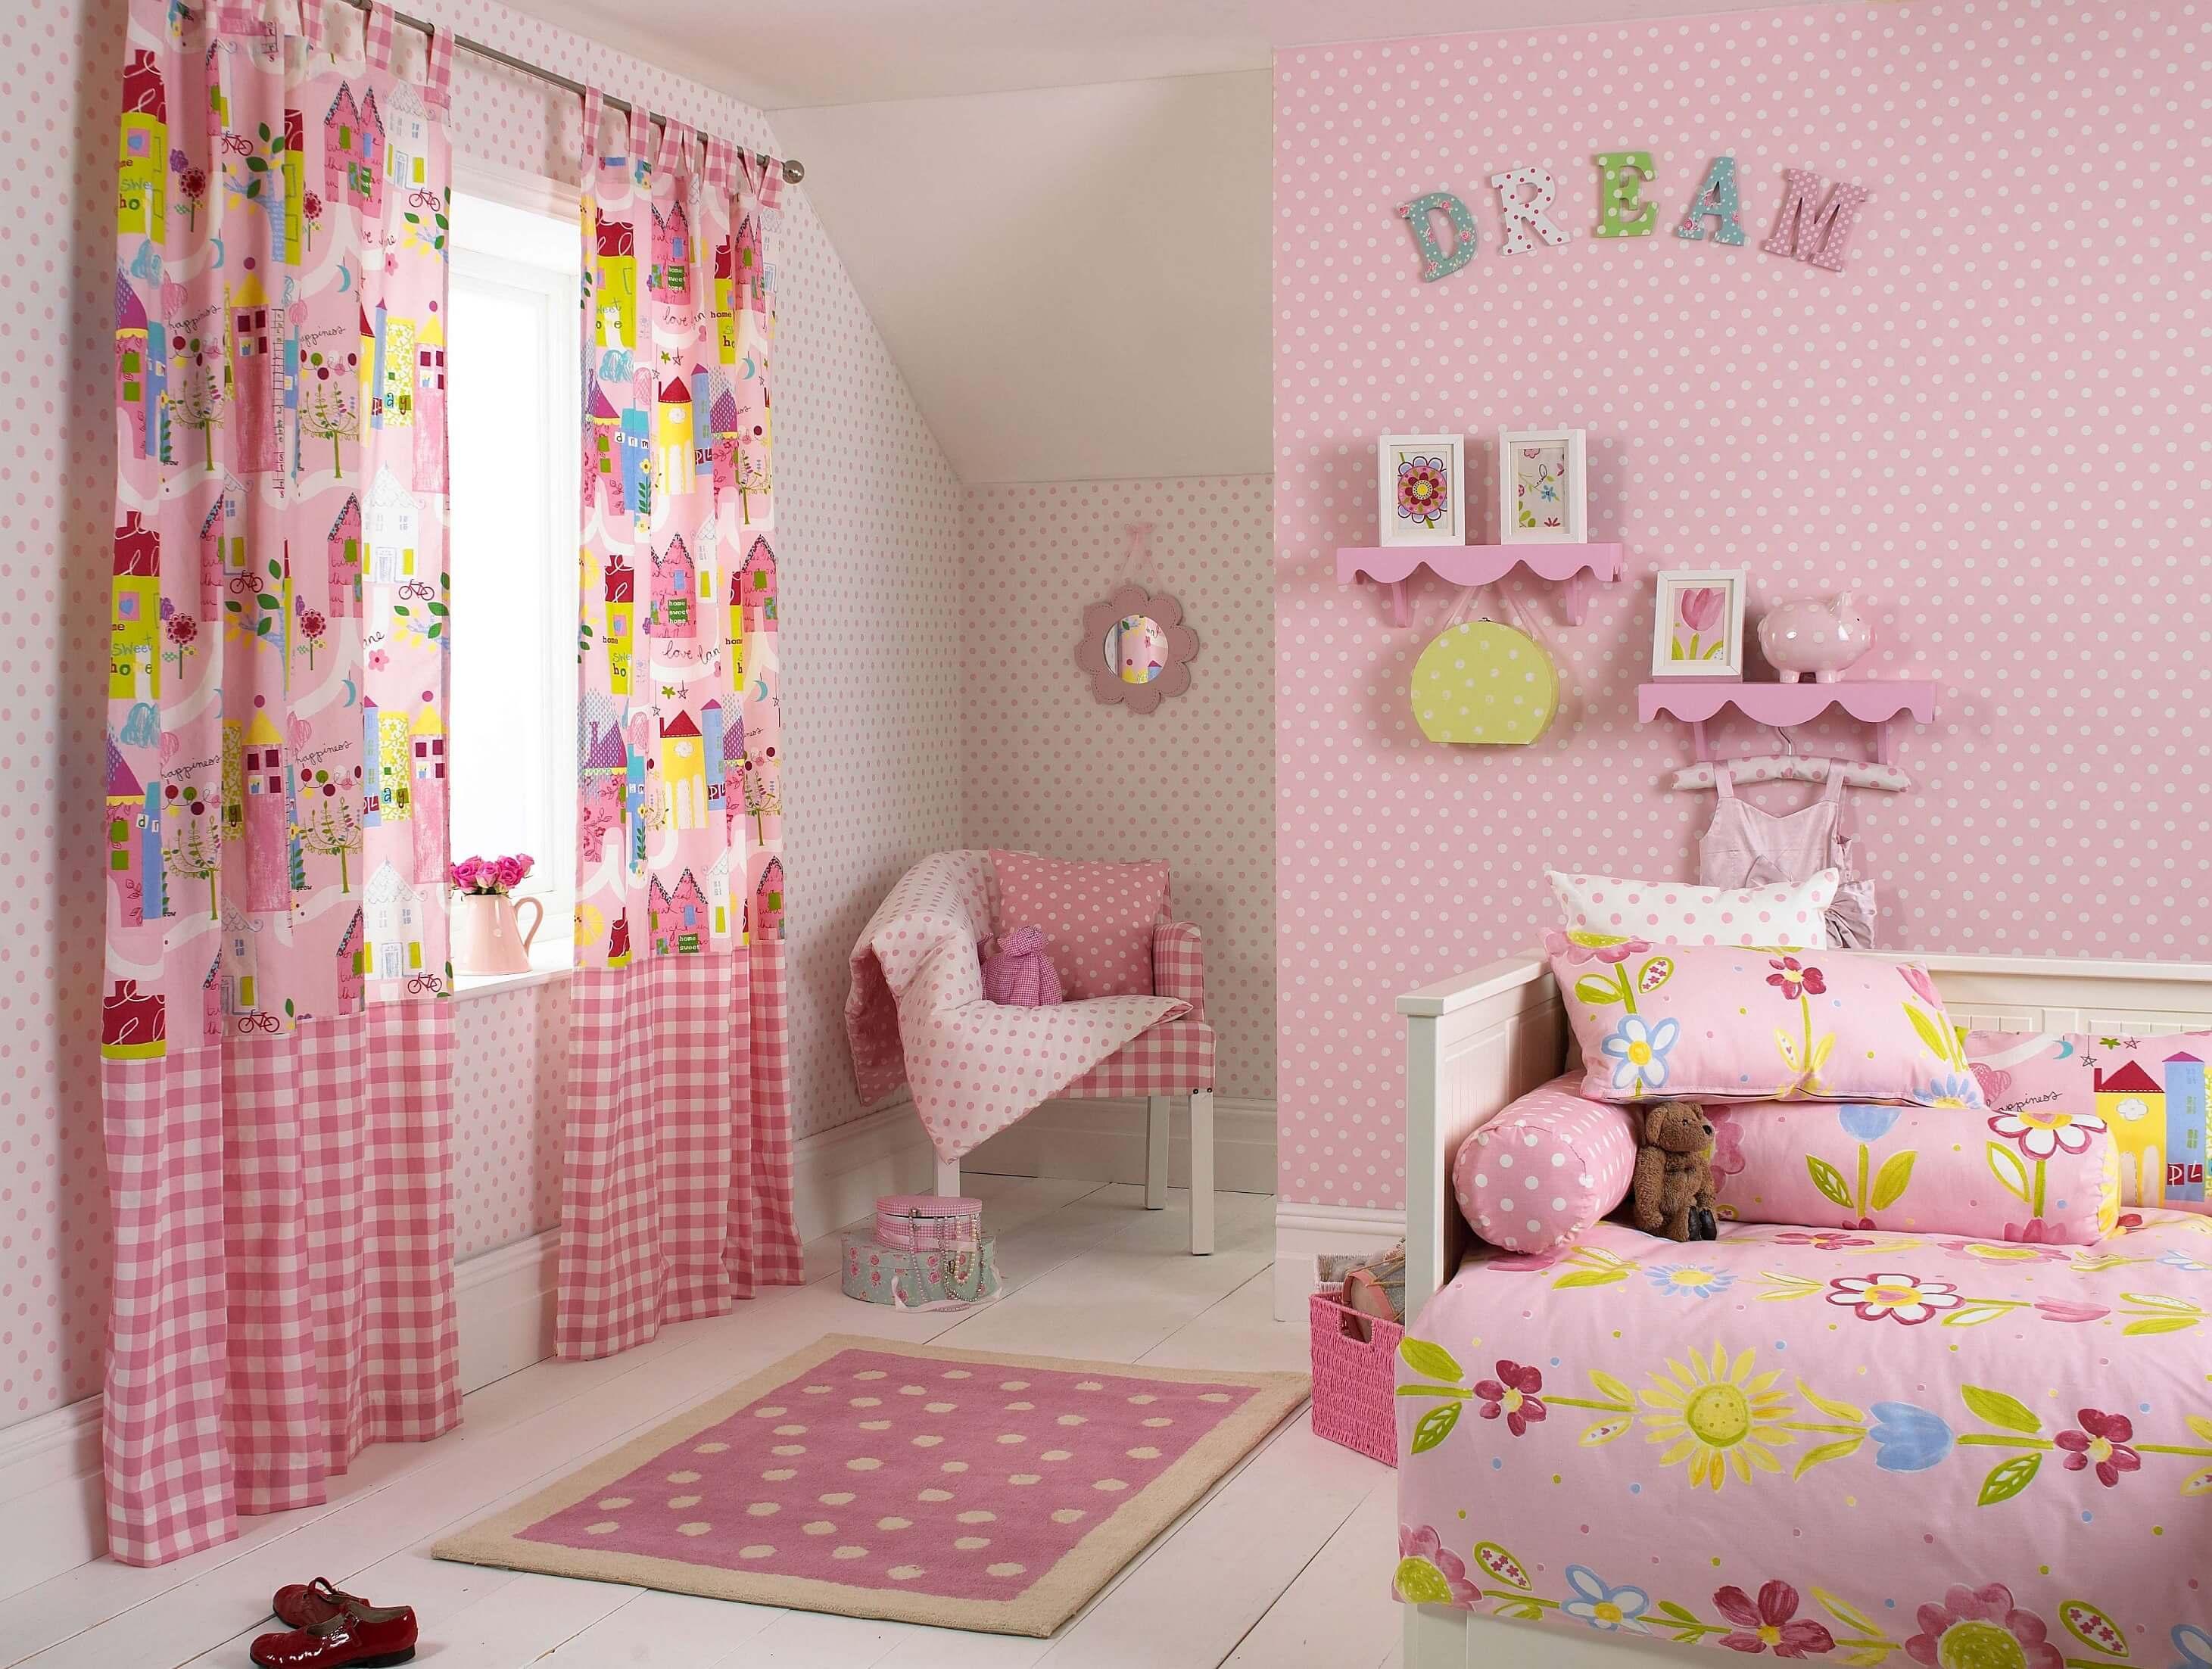 Mooie Meisjes slaapkamer inrichten - Tips & Inspiratie | Wiki Wonen